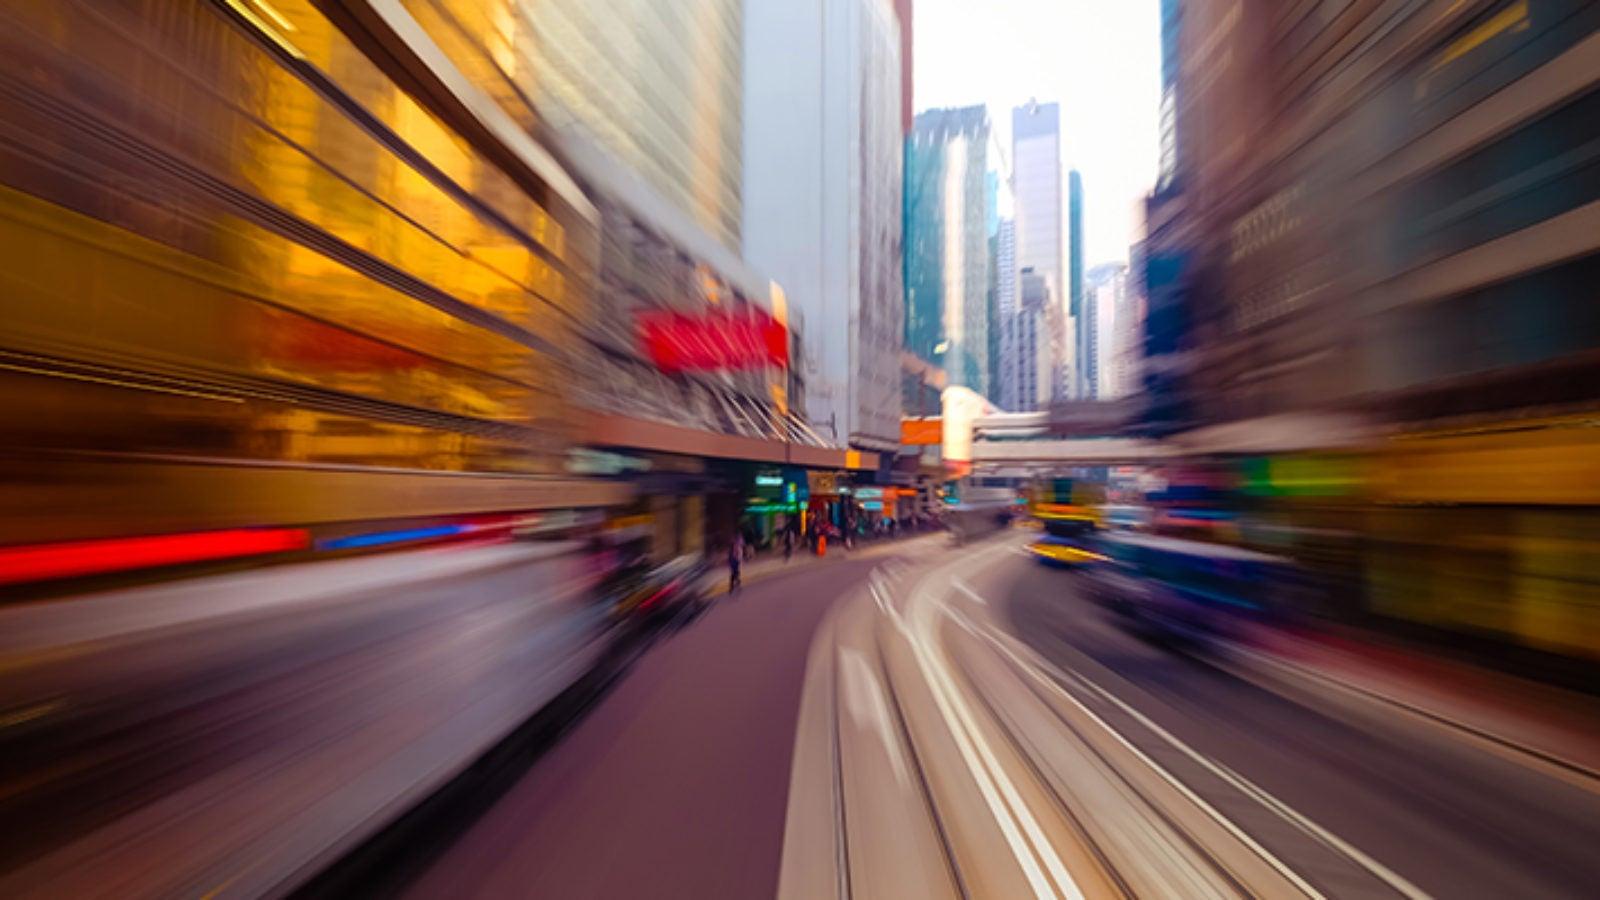 blurred image of road between skyscrapers